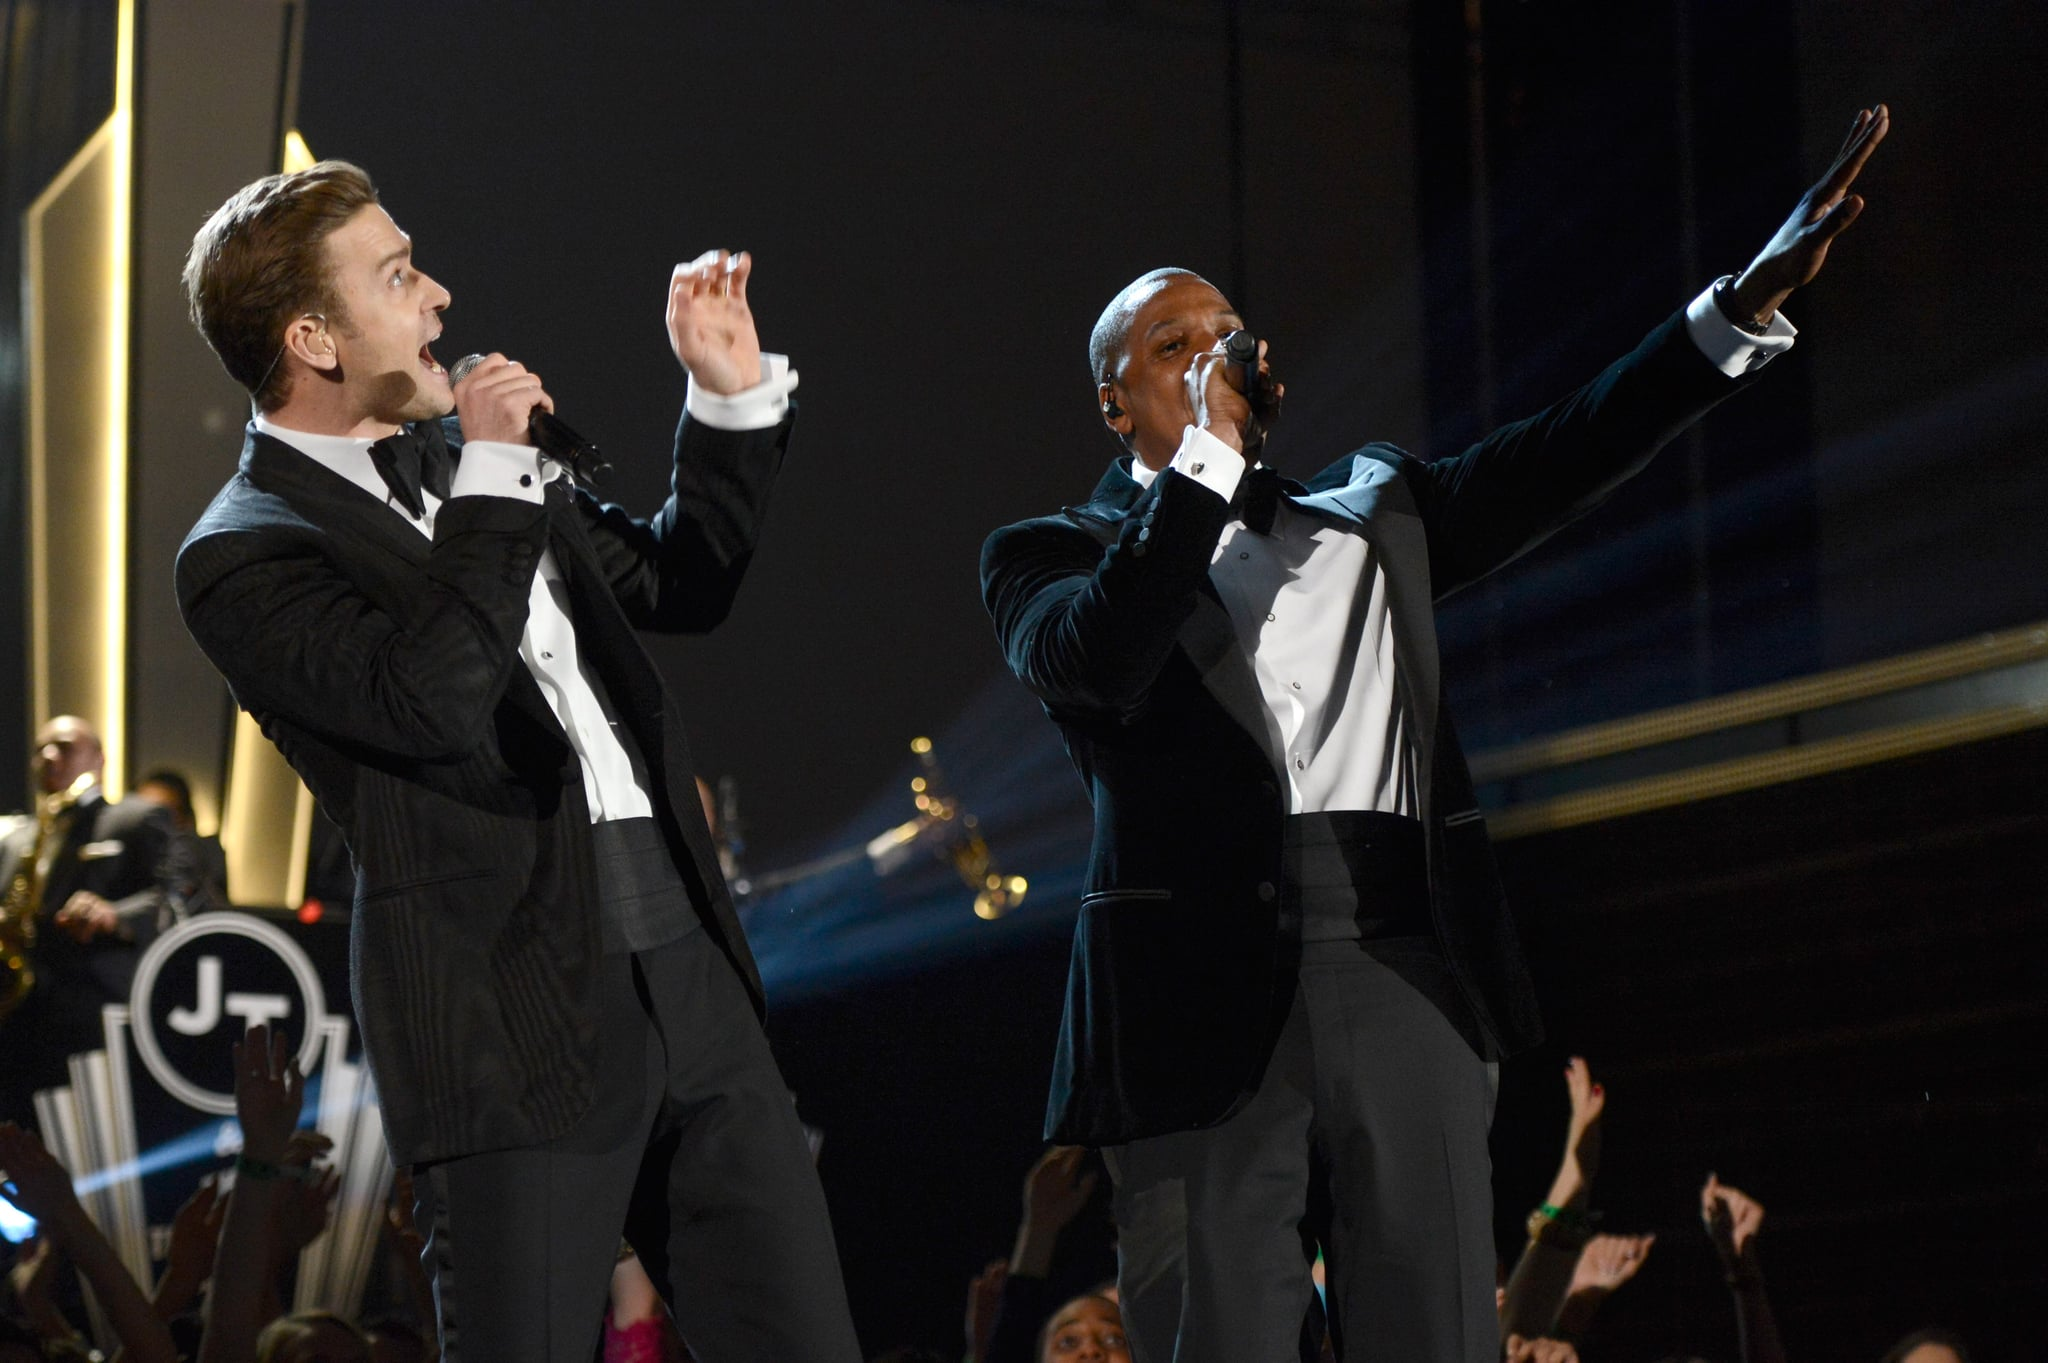 Justin Timberlake performed alongside Jay-Z.